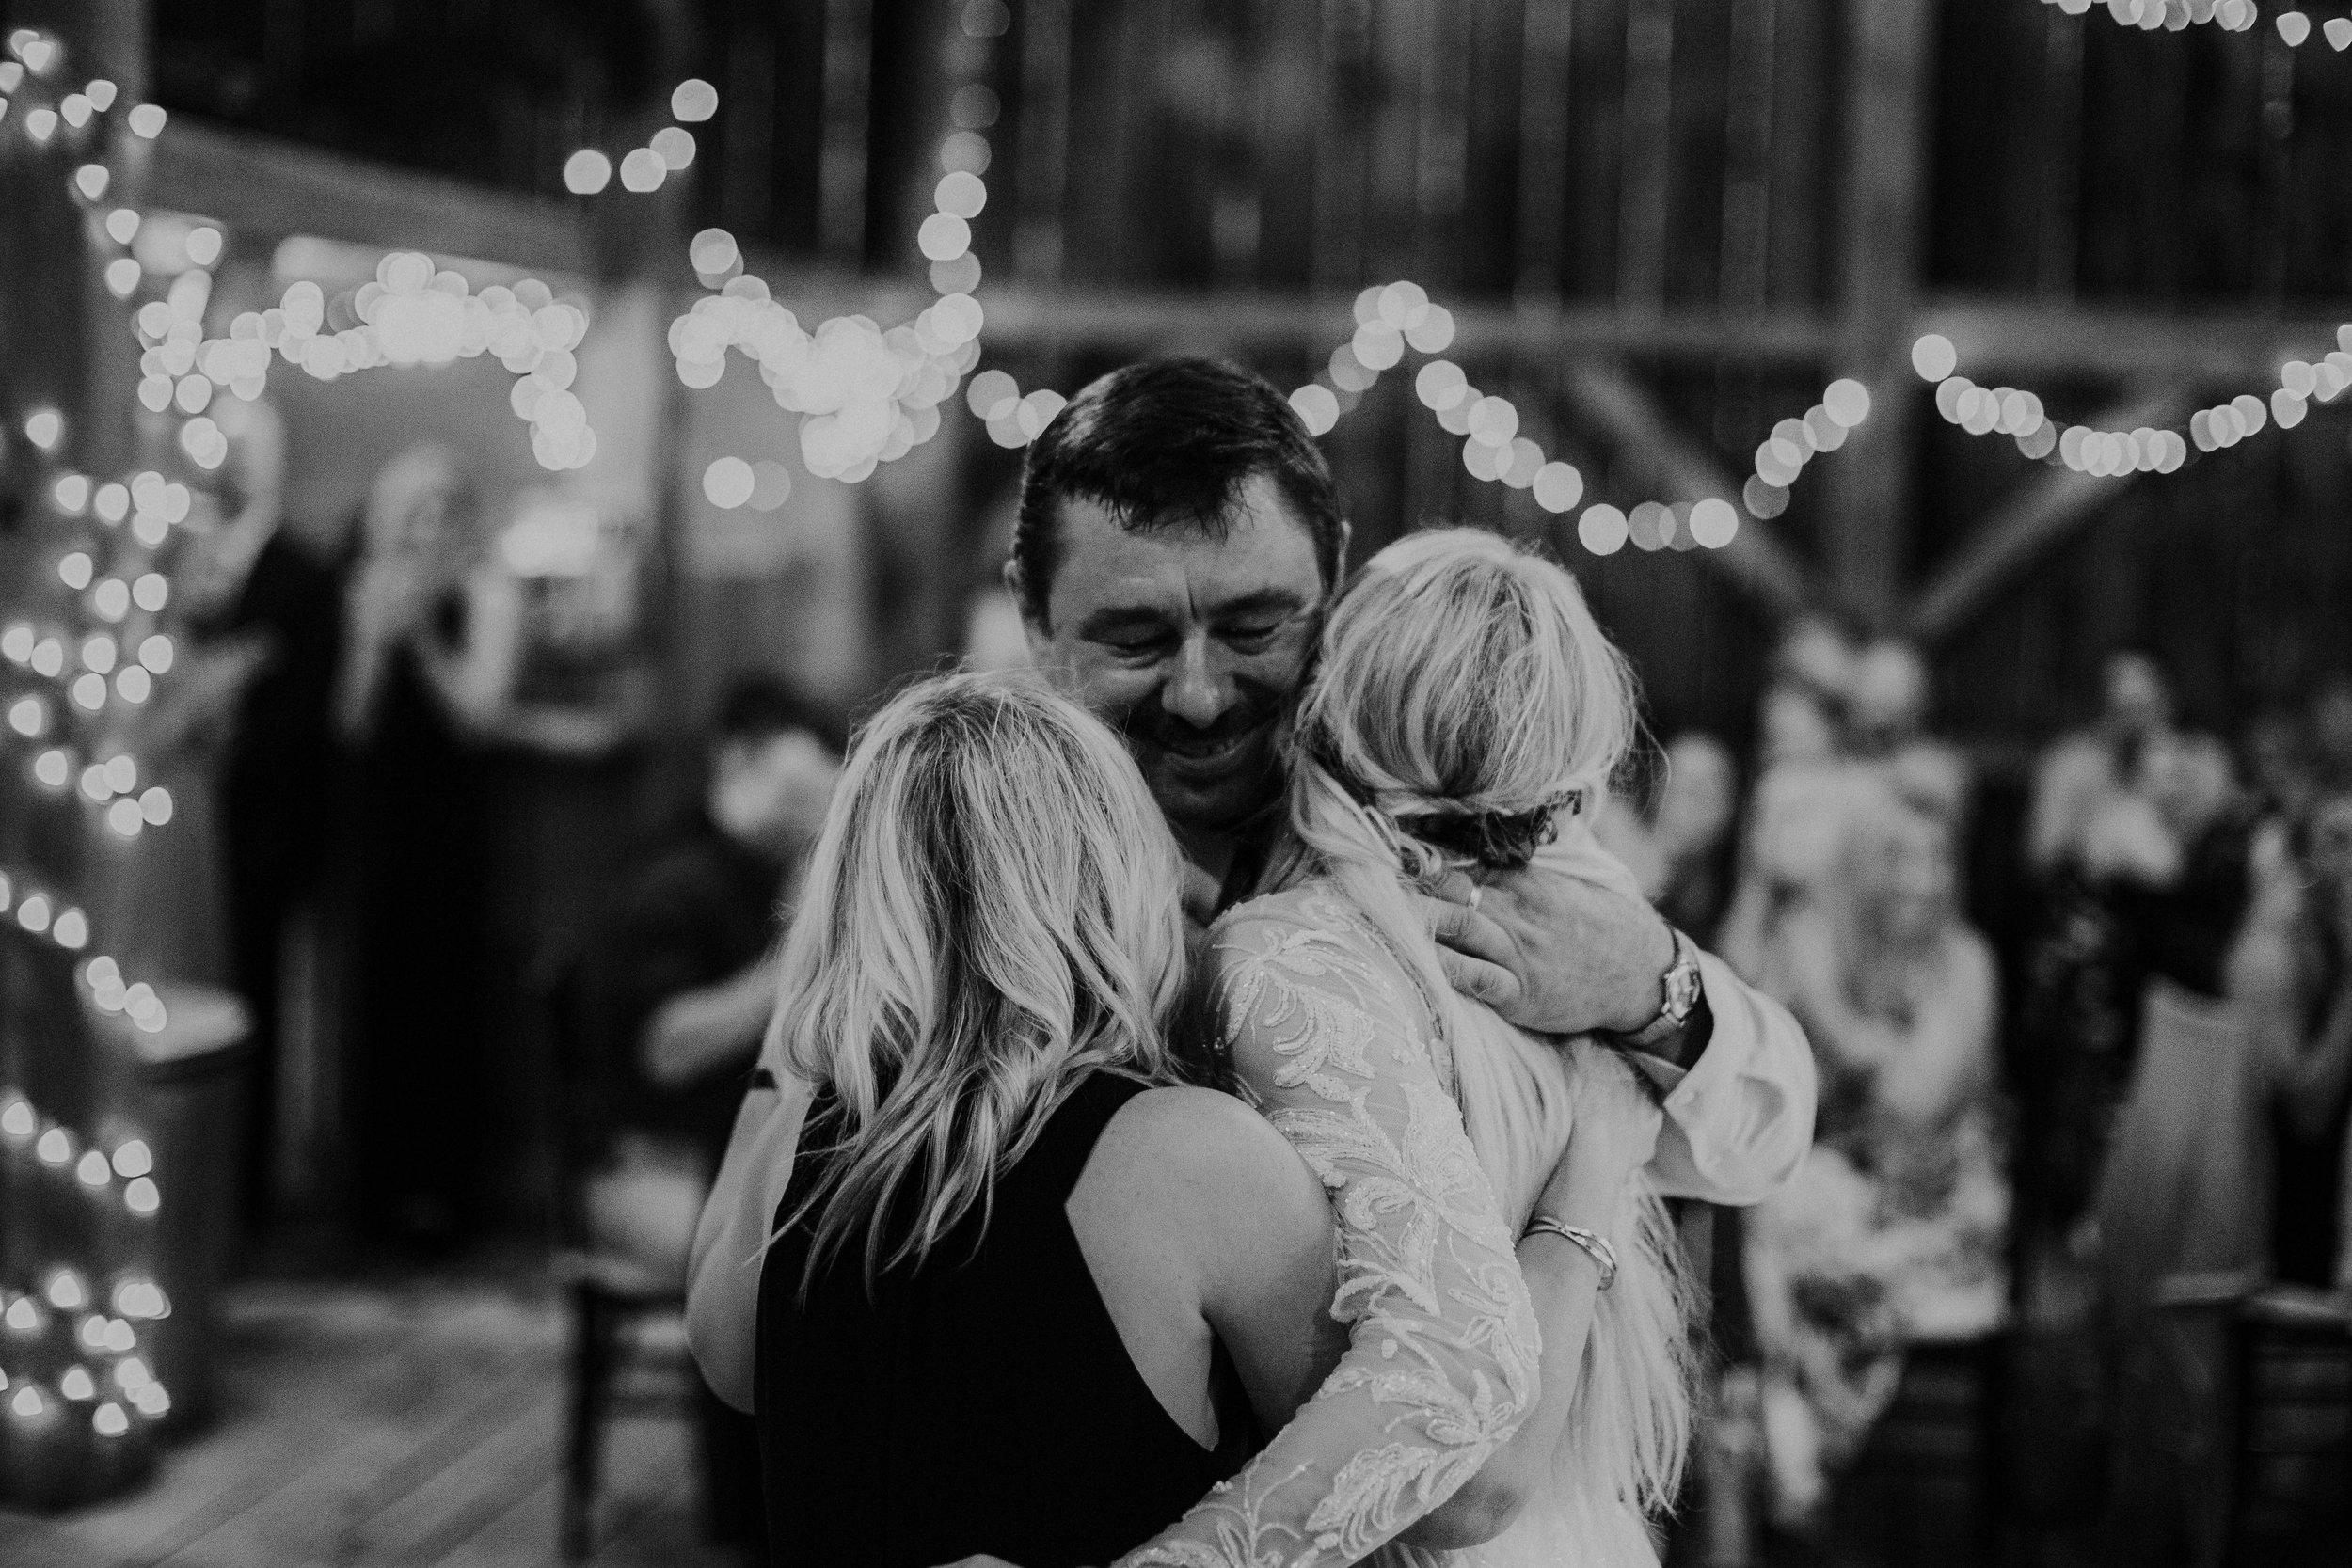 Columbus ohio wedding photographer canyon run ranch wedding grace e jones photography wedding photographer238.jpg